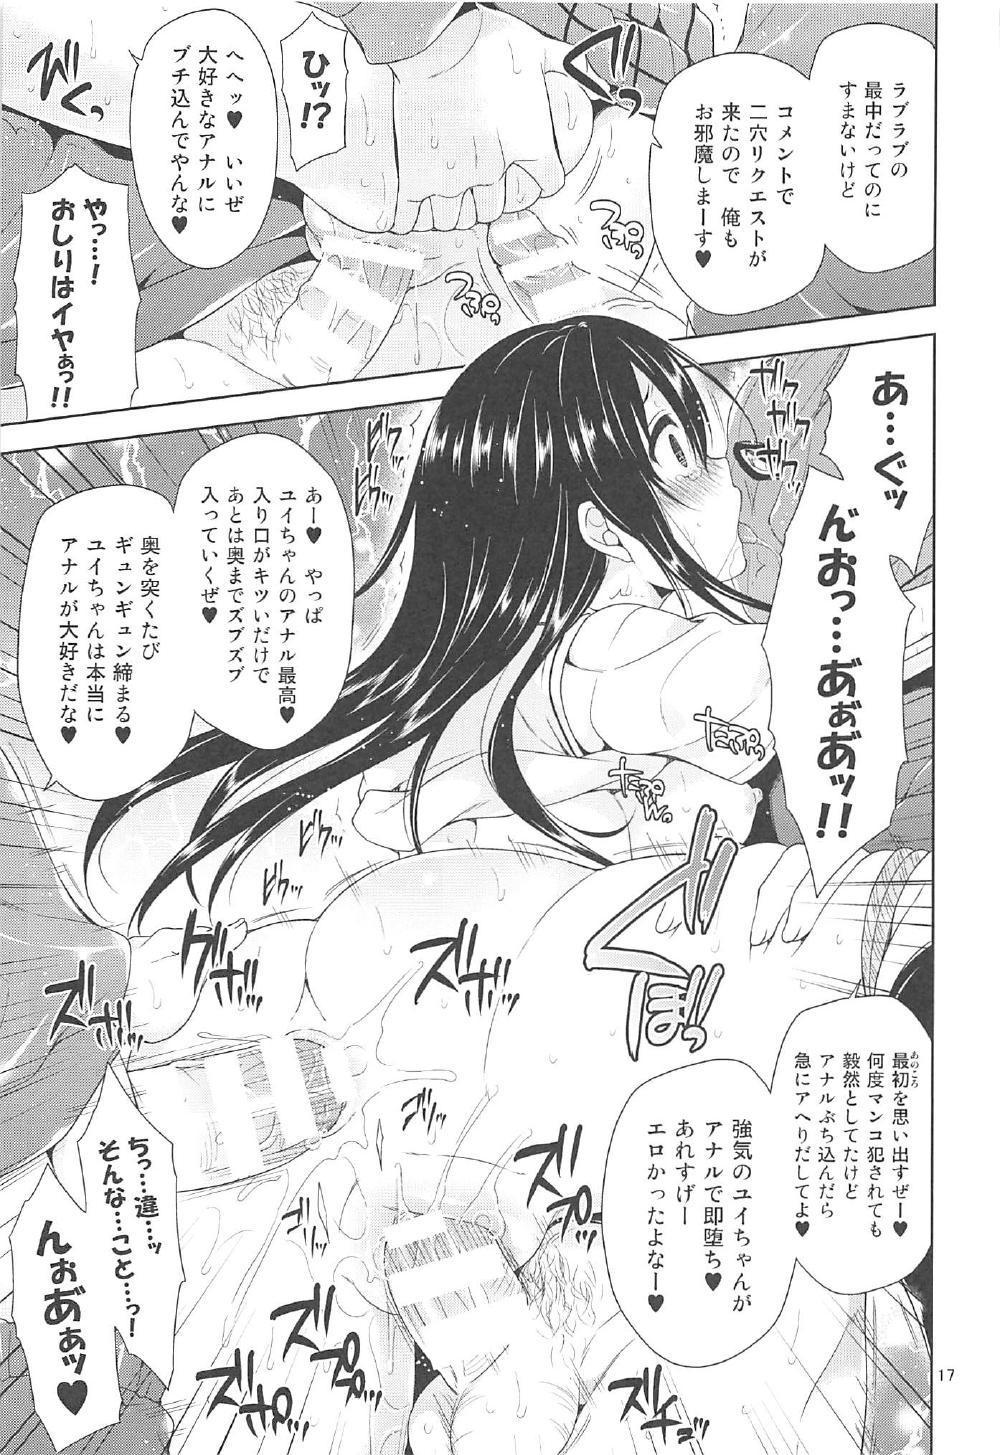 Sairoku March Trouble 3 15